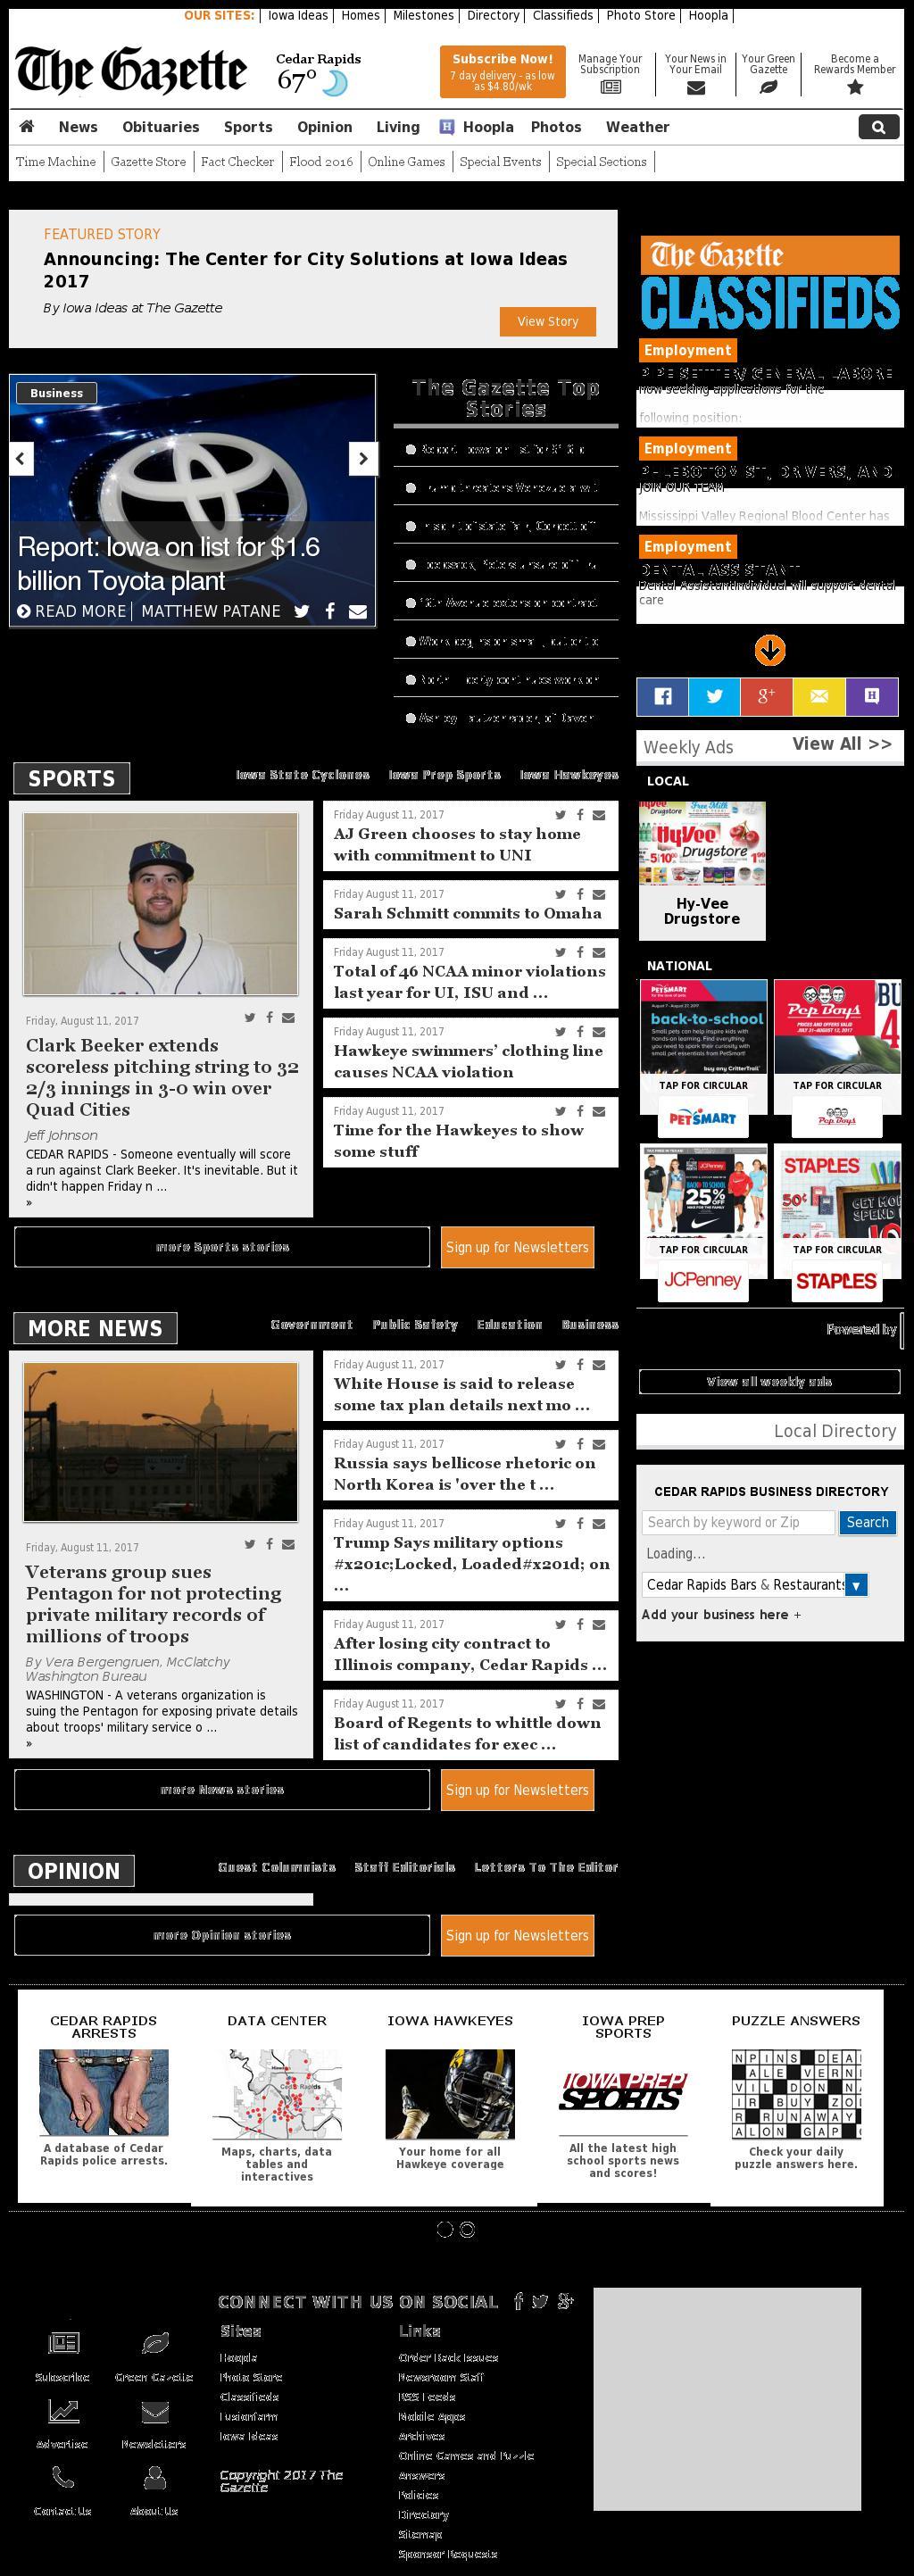 The (Cedar Rapids) Gazette at Saturday Aug. 12, 2017, 4:06 a.m. UTC